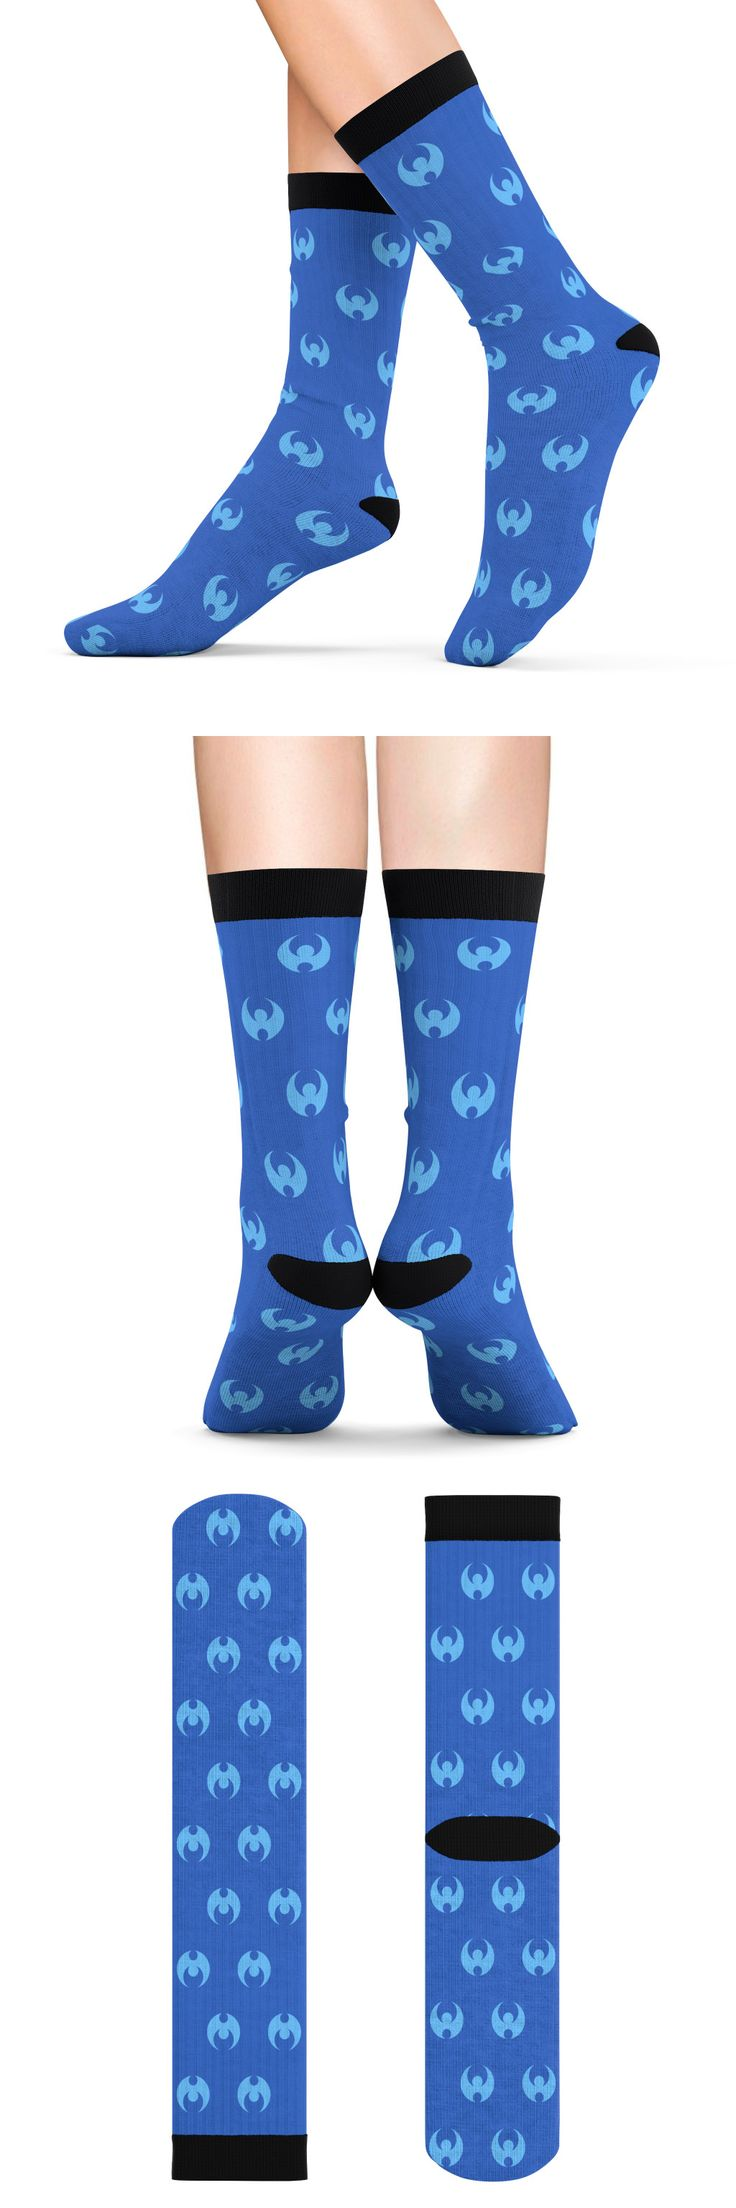 #pokemon #moon #nintendo #alola #giftsforher #3ds #socks #trinketgeek